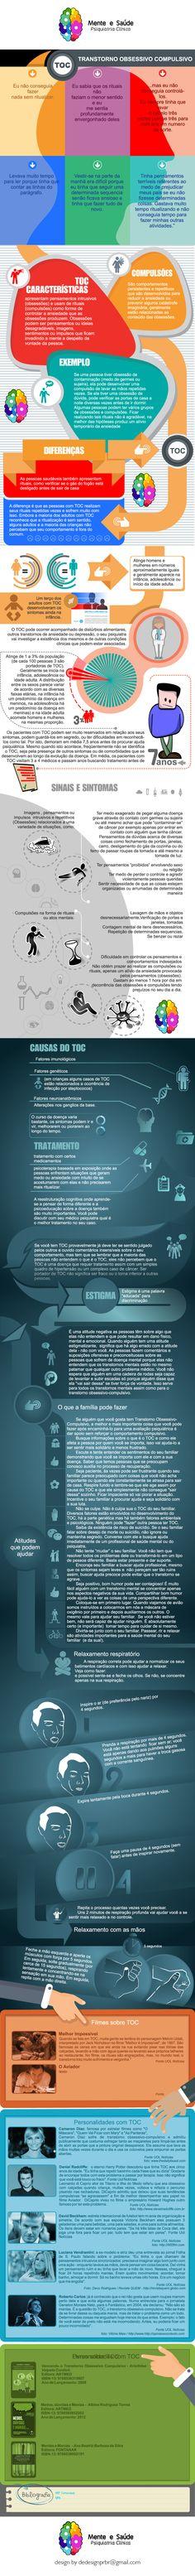 Design, Infografico, psquiatria, dicas, sintomas TOC, OCD, infographic, psychiatry, sintoms.